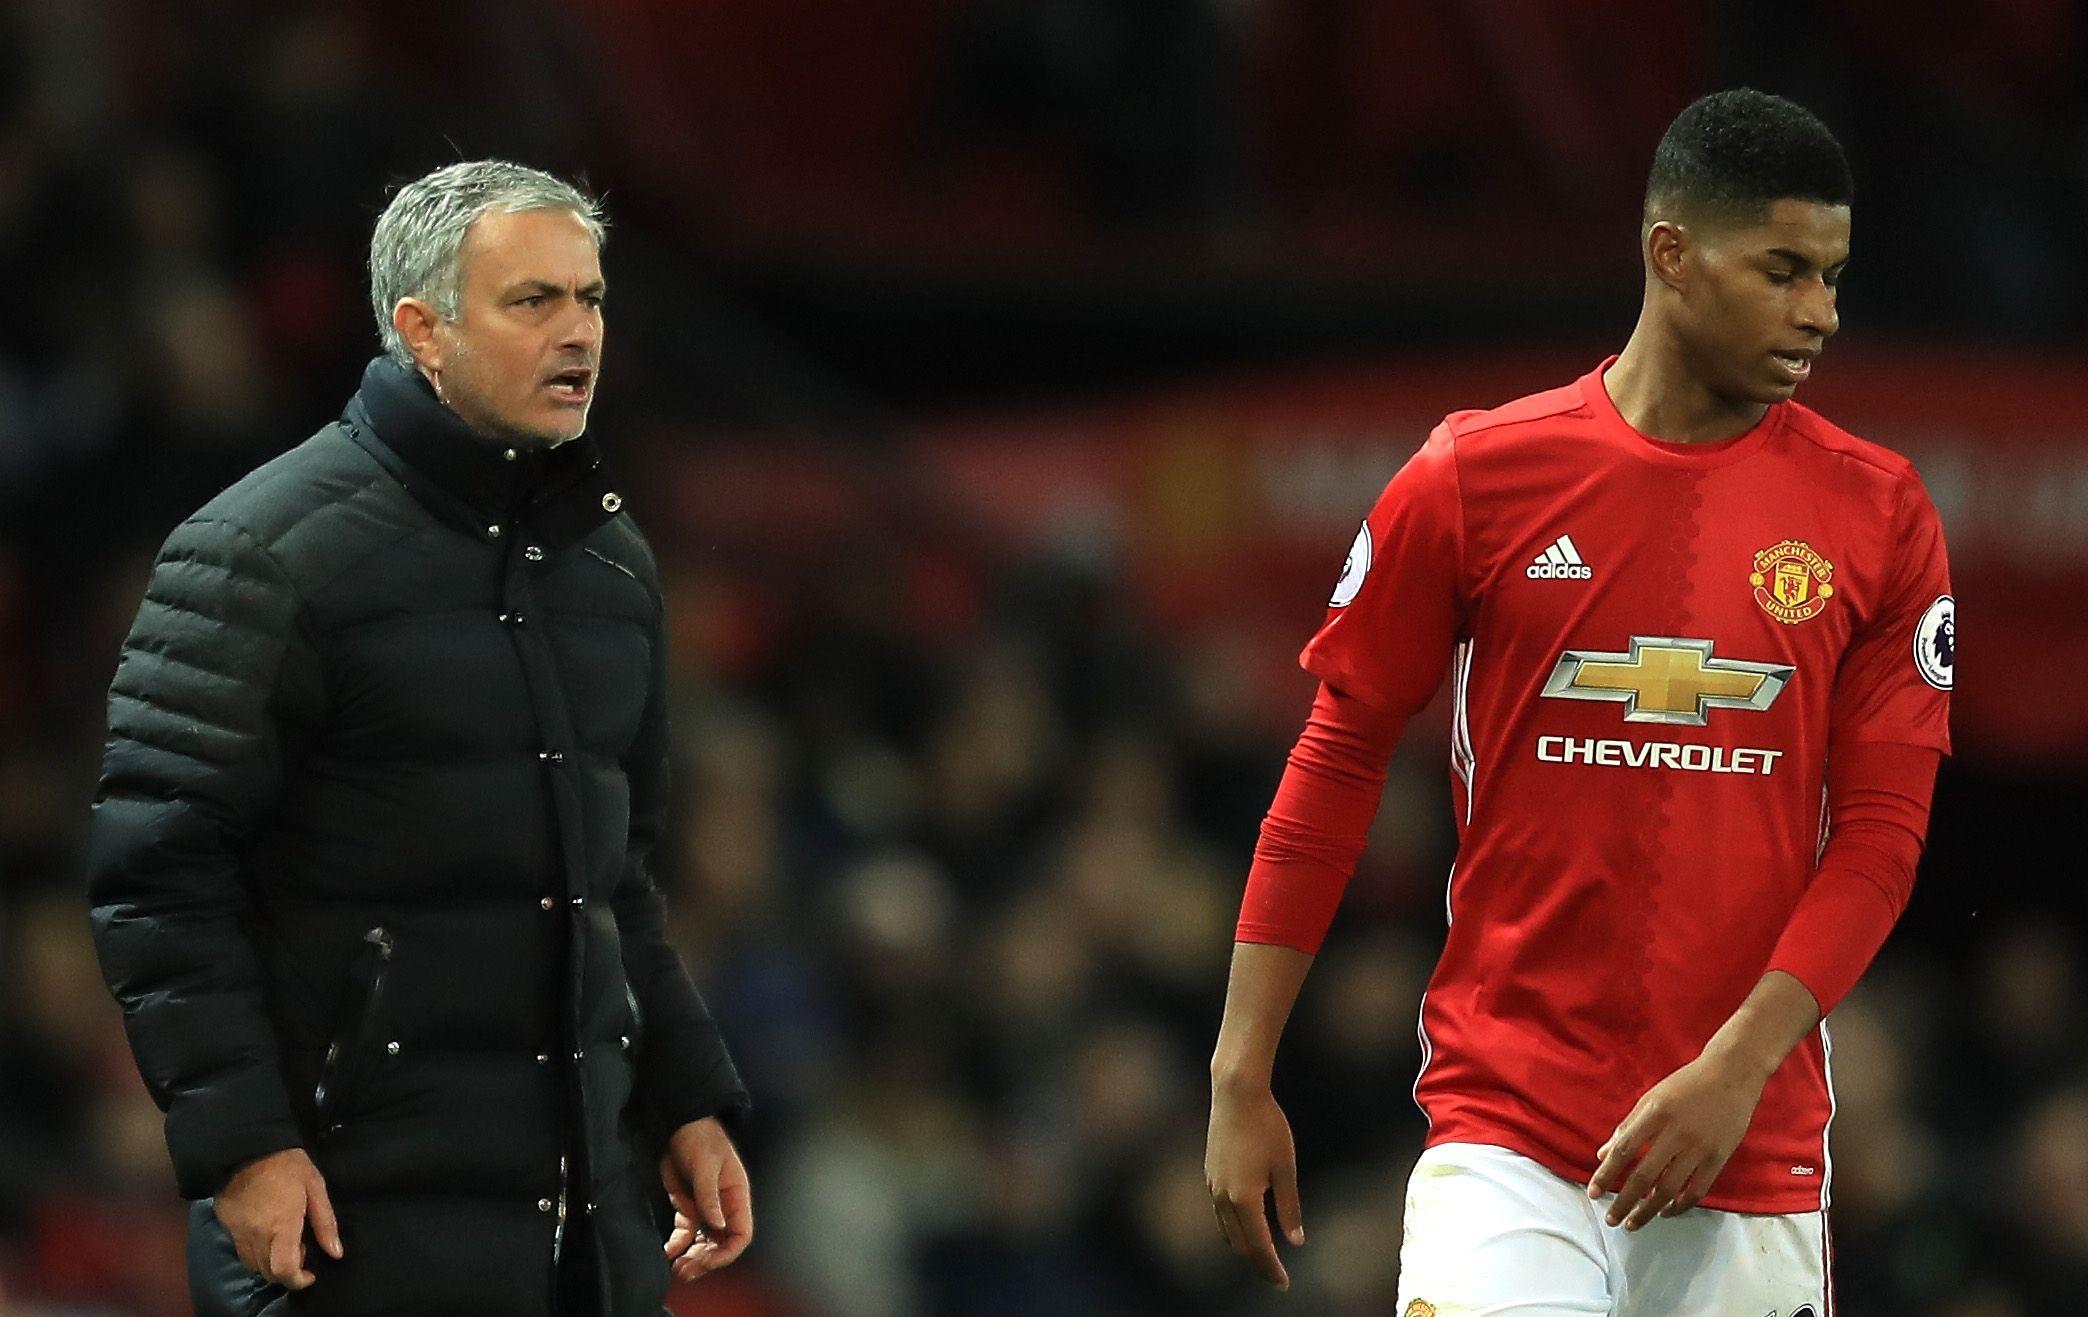 Manchester United manager Jose Mourinho, left, with Marcus Rashford.